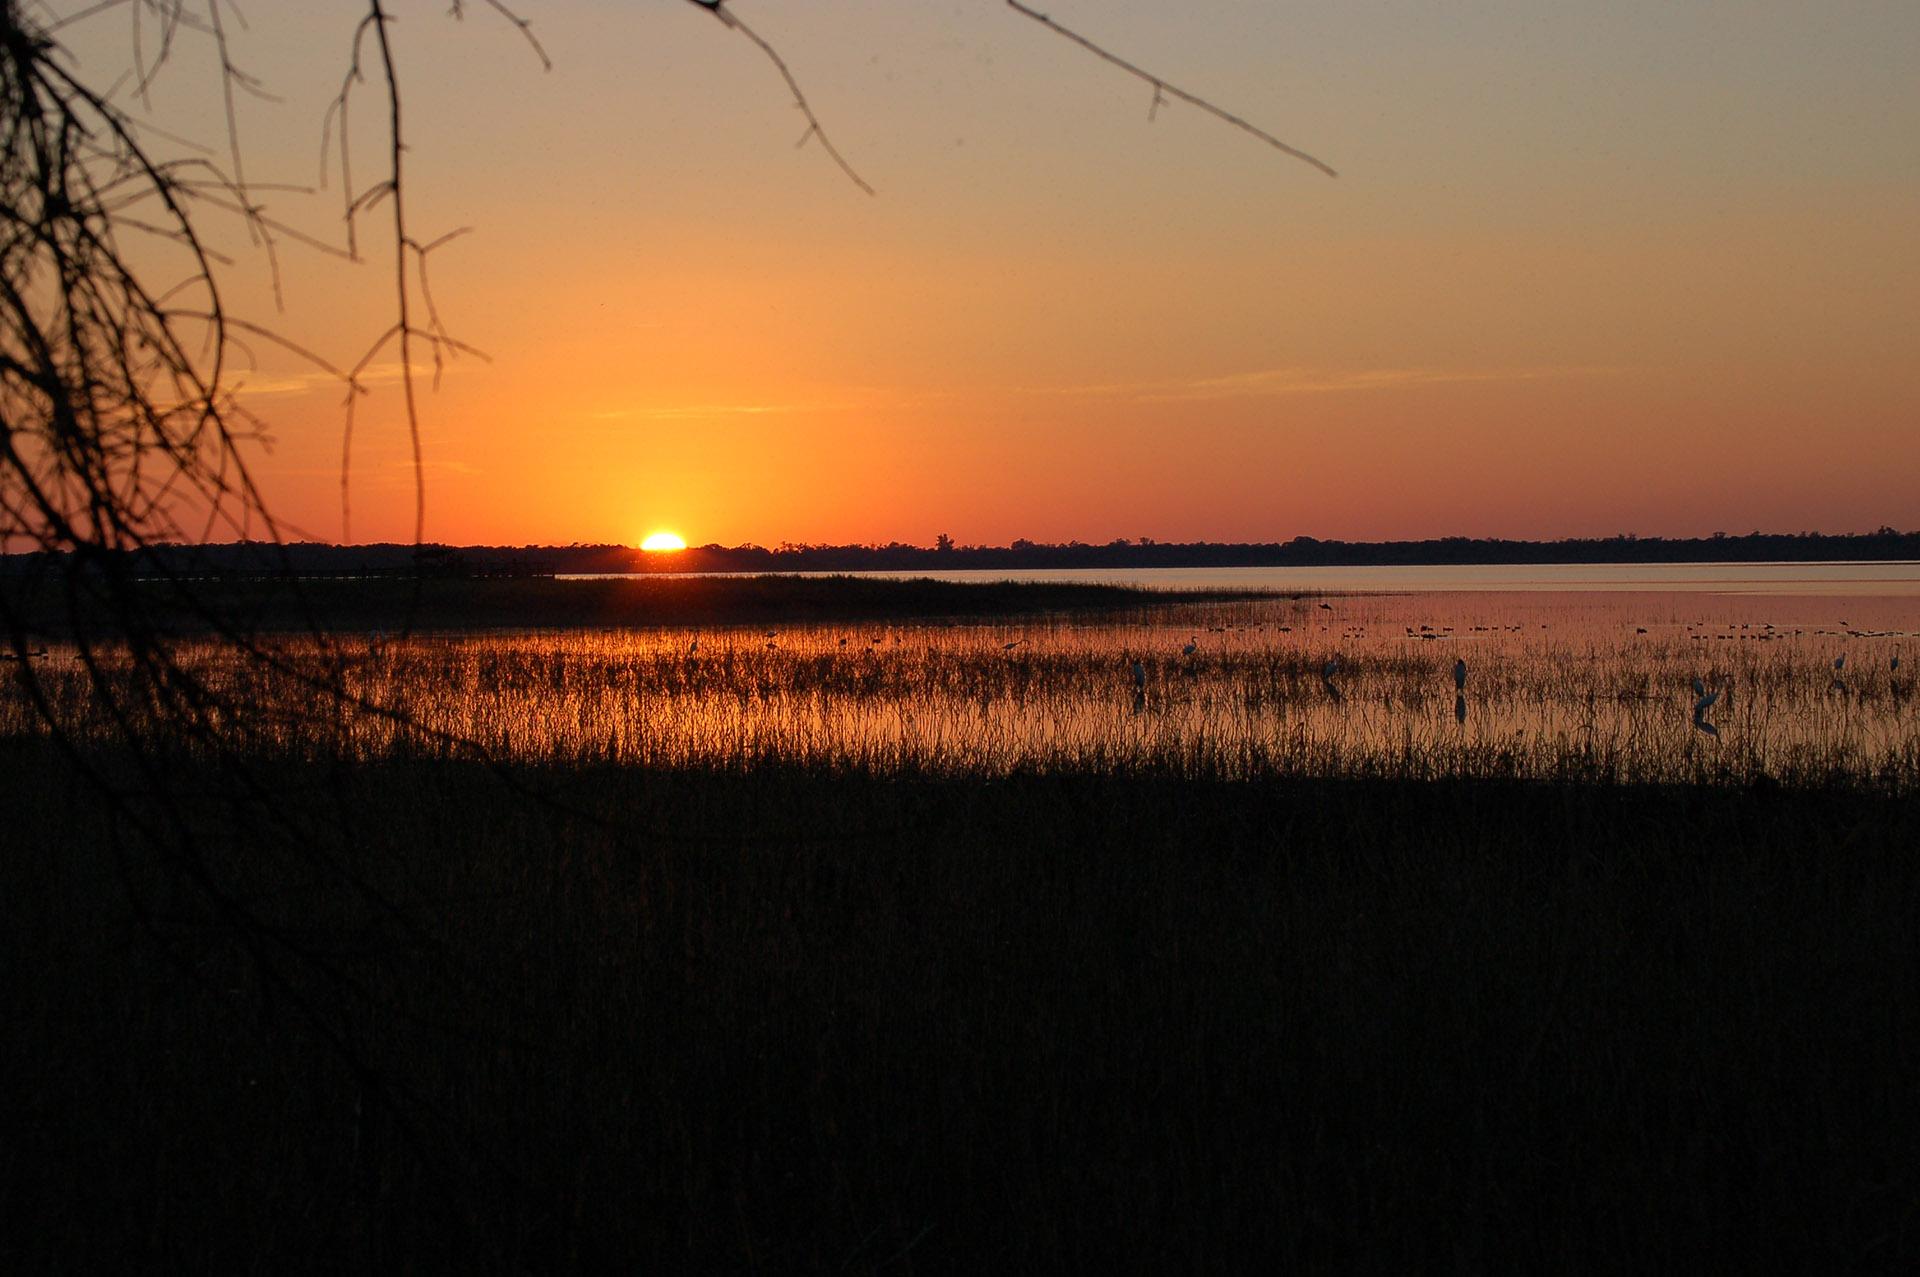 Myakka River State Park, Sarasota County